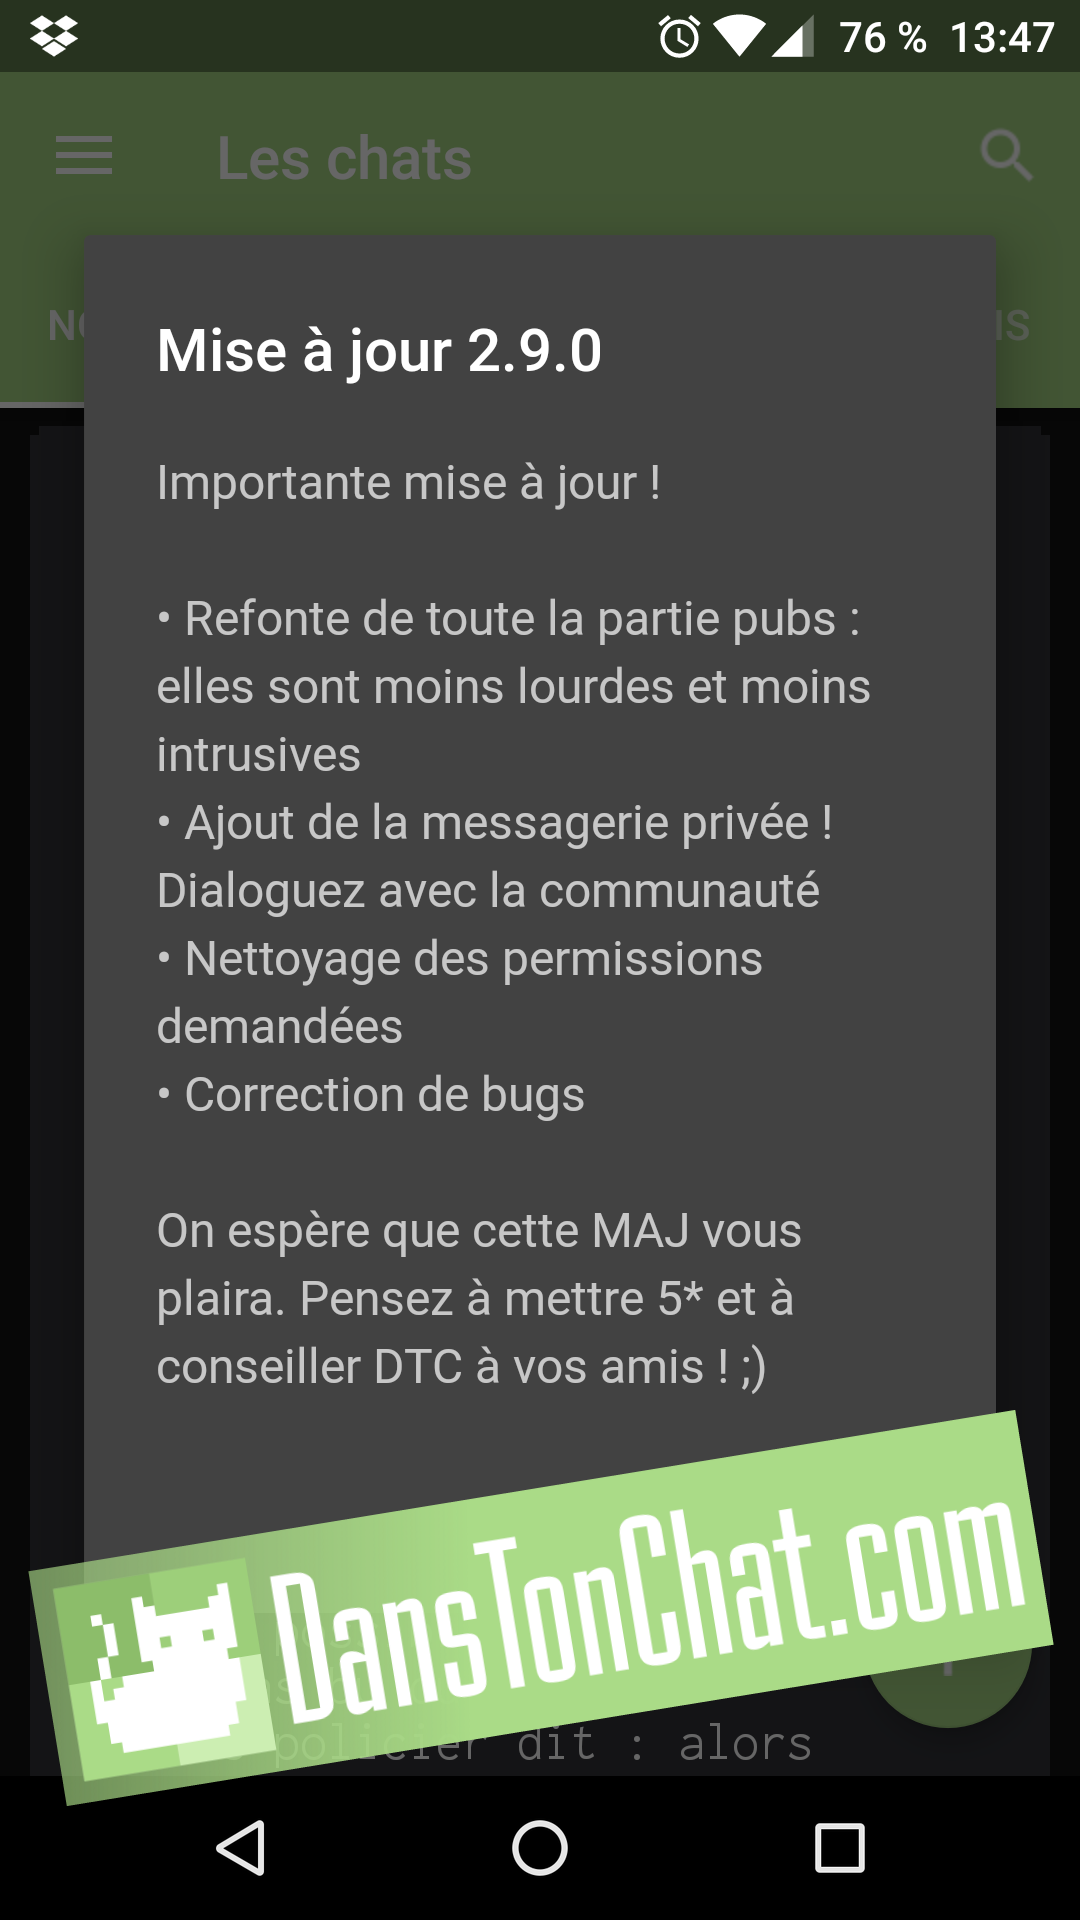 Appli DTC version 2.9.0